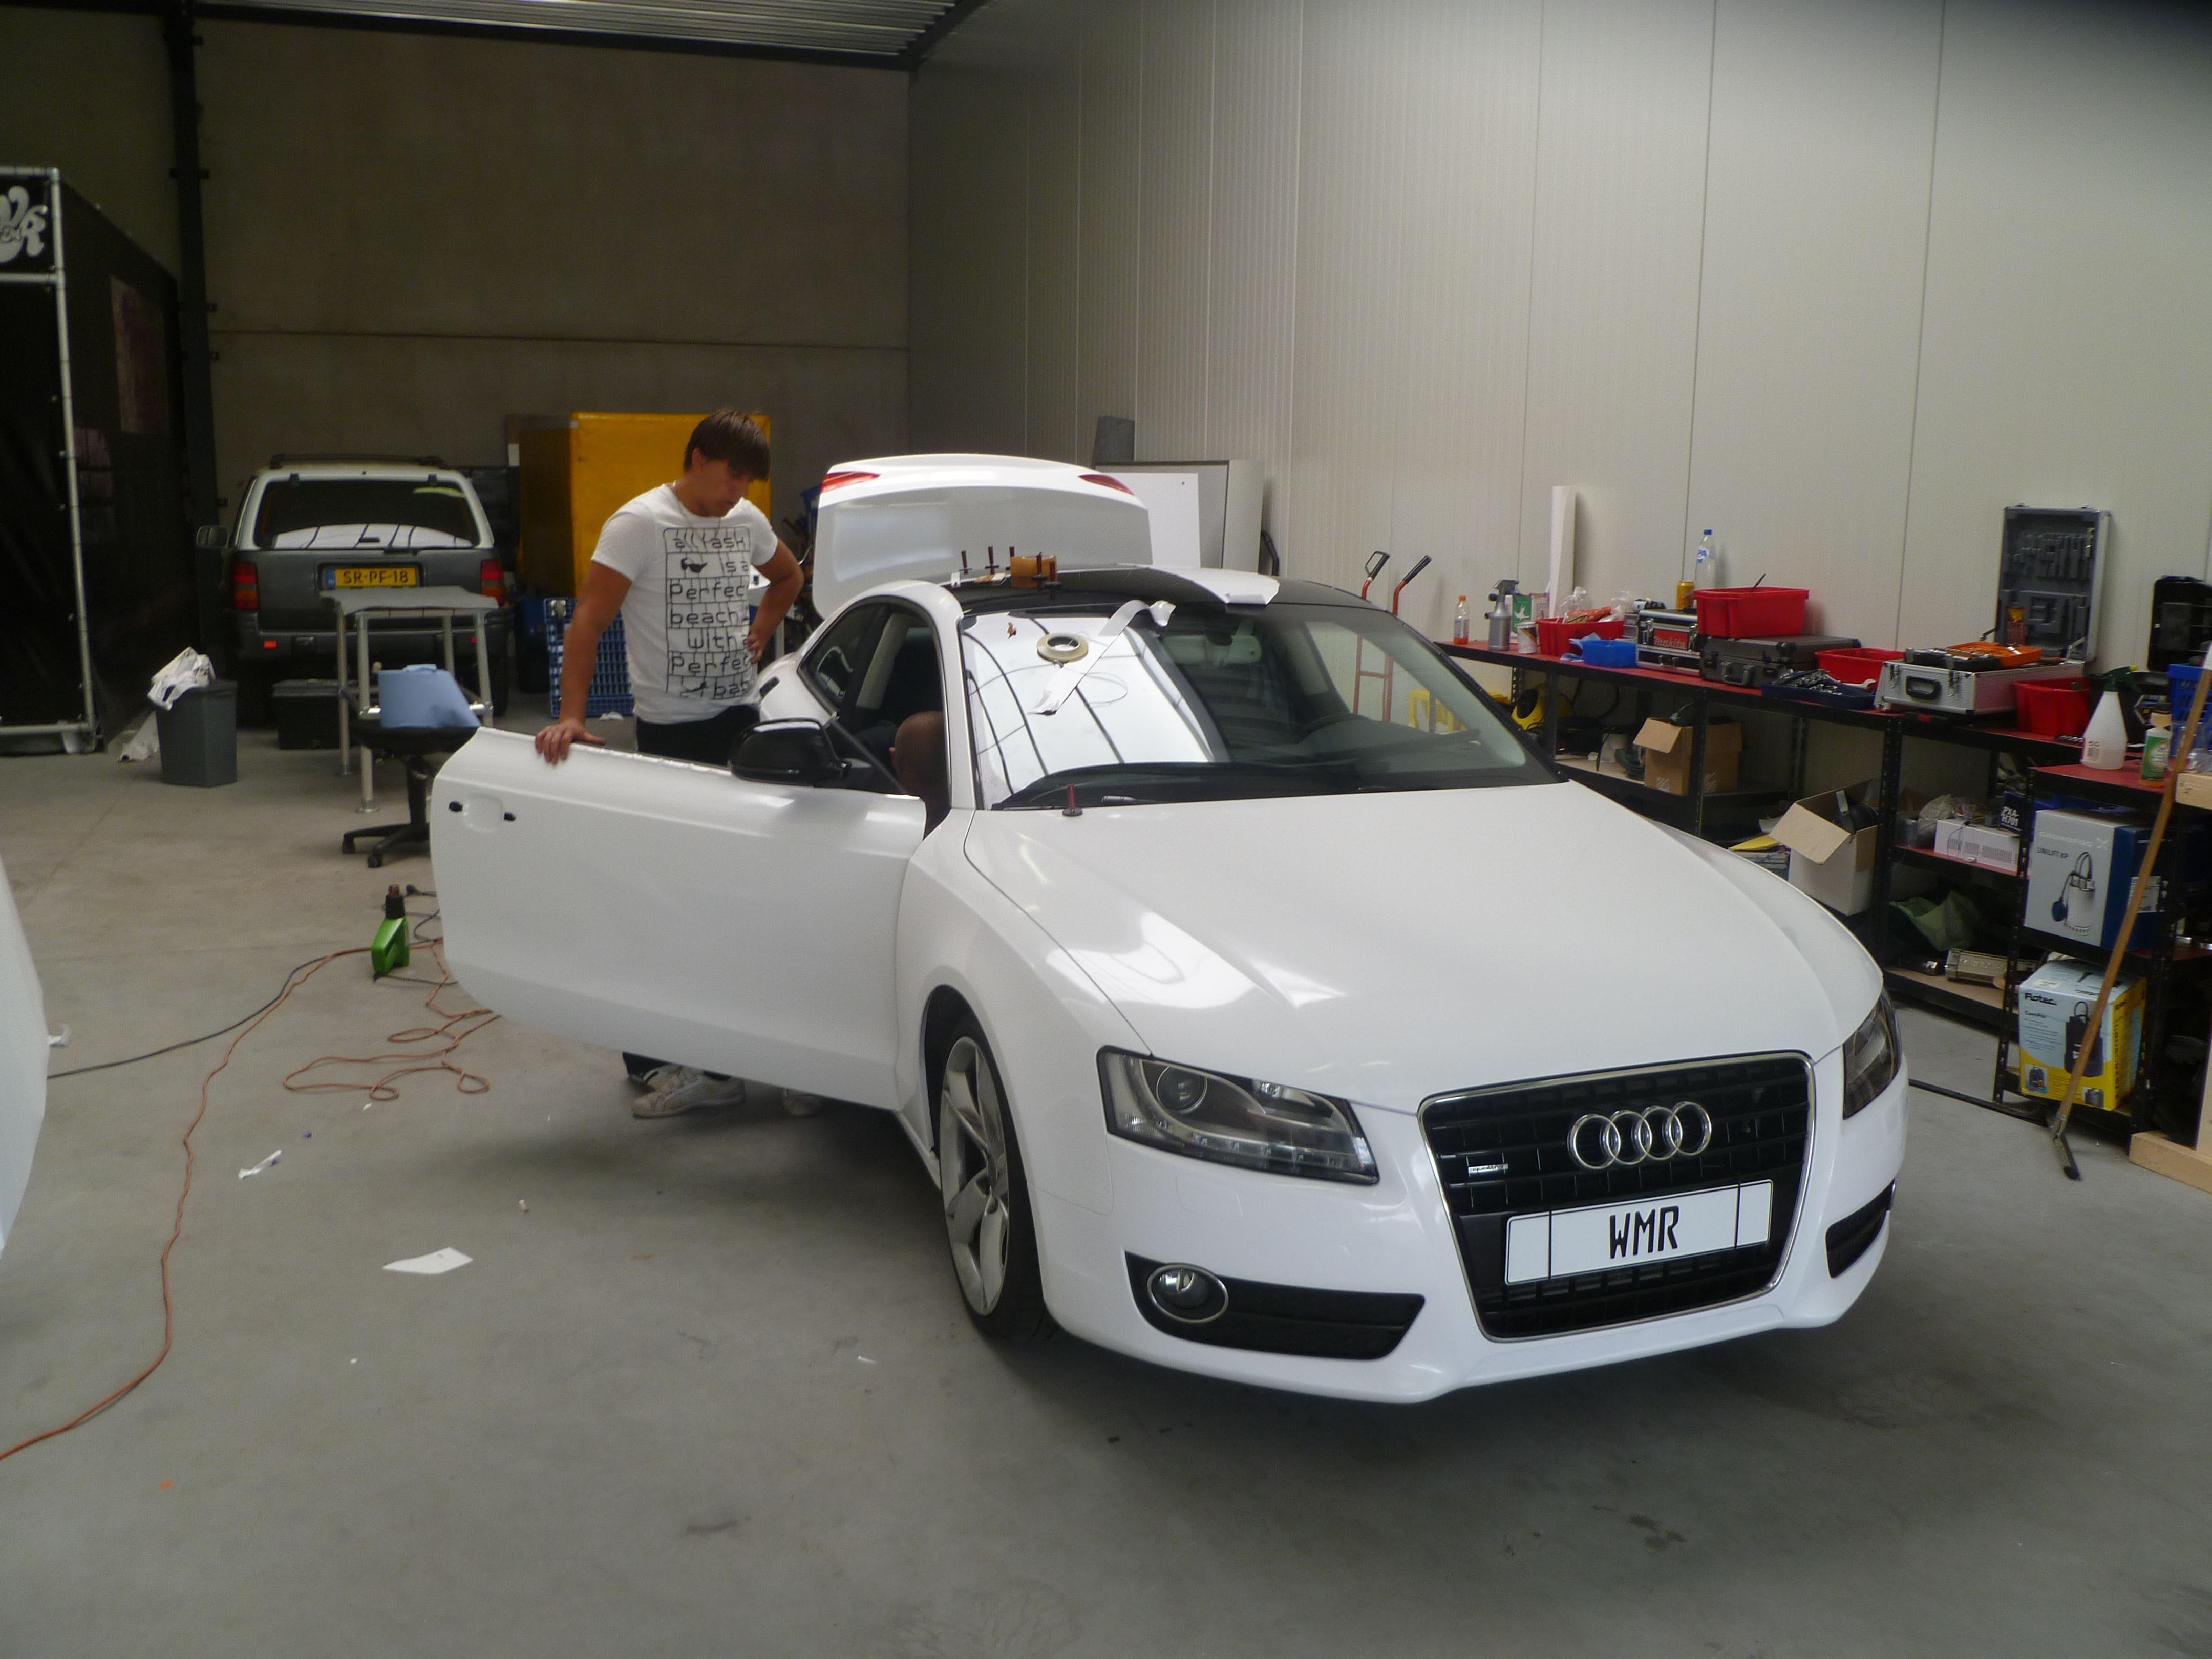 Audi A5 coupe met Metallic Witte Wrap, Carwrapping door Wrapmyride.nu Foto-nr:4718, ©2021